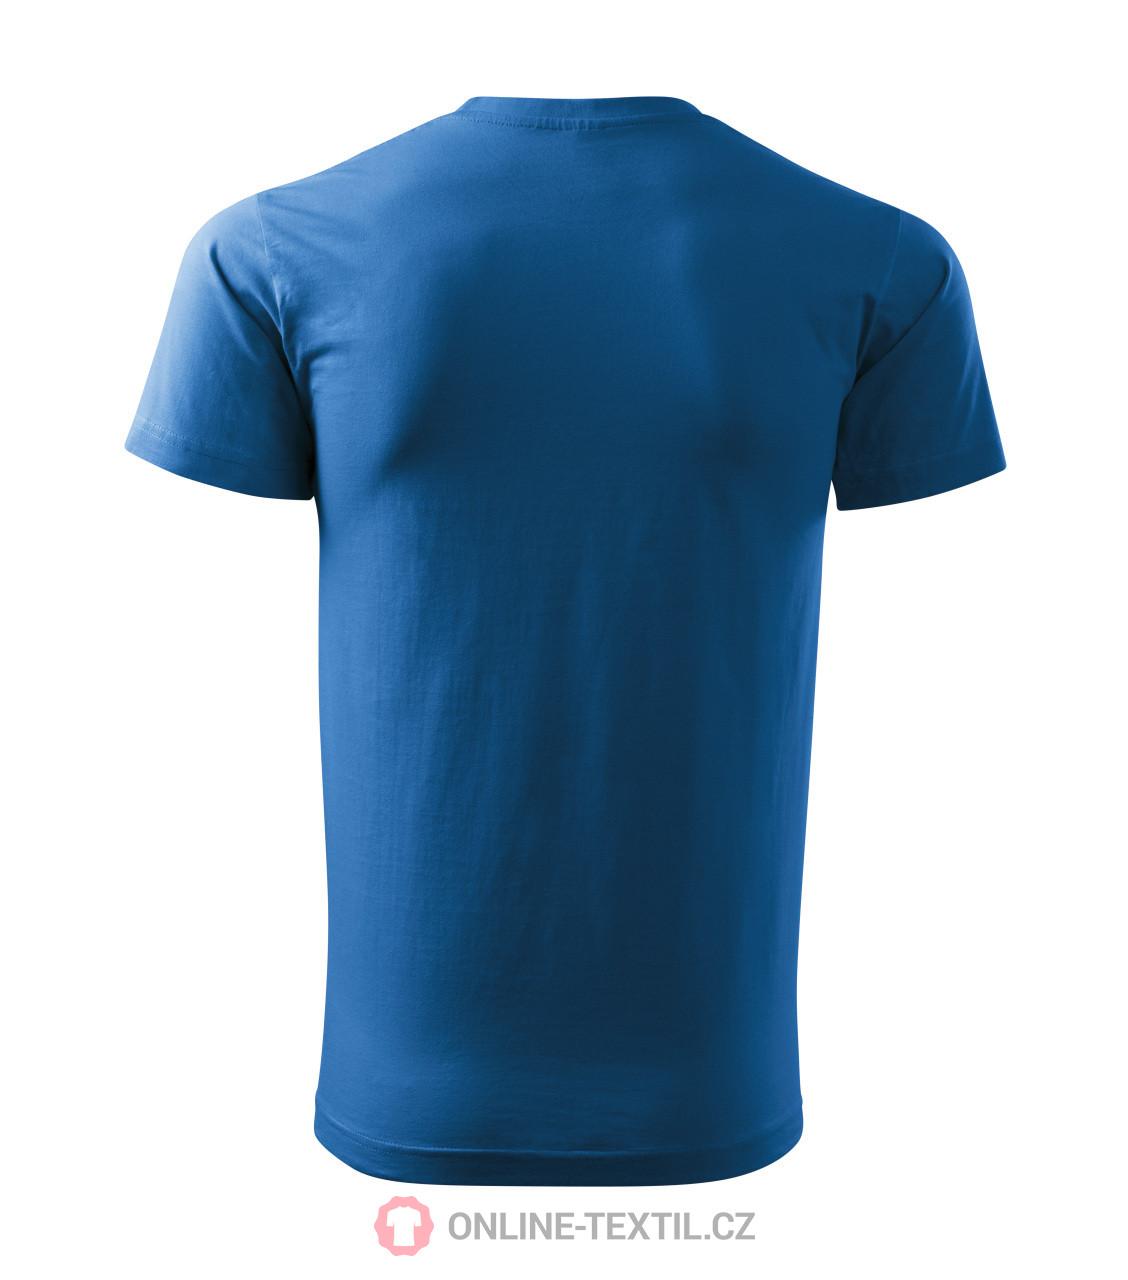 10ec5ac12285 ADLER CZECH Gents T-shirt Basic 129 - azure blue from the MALFINI ...